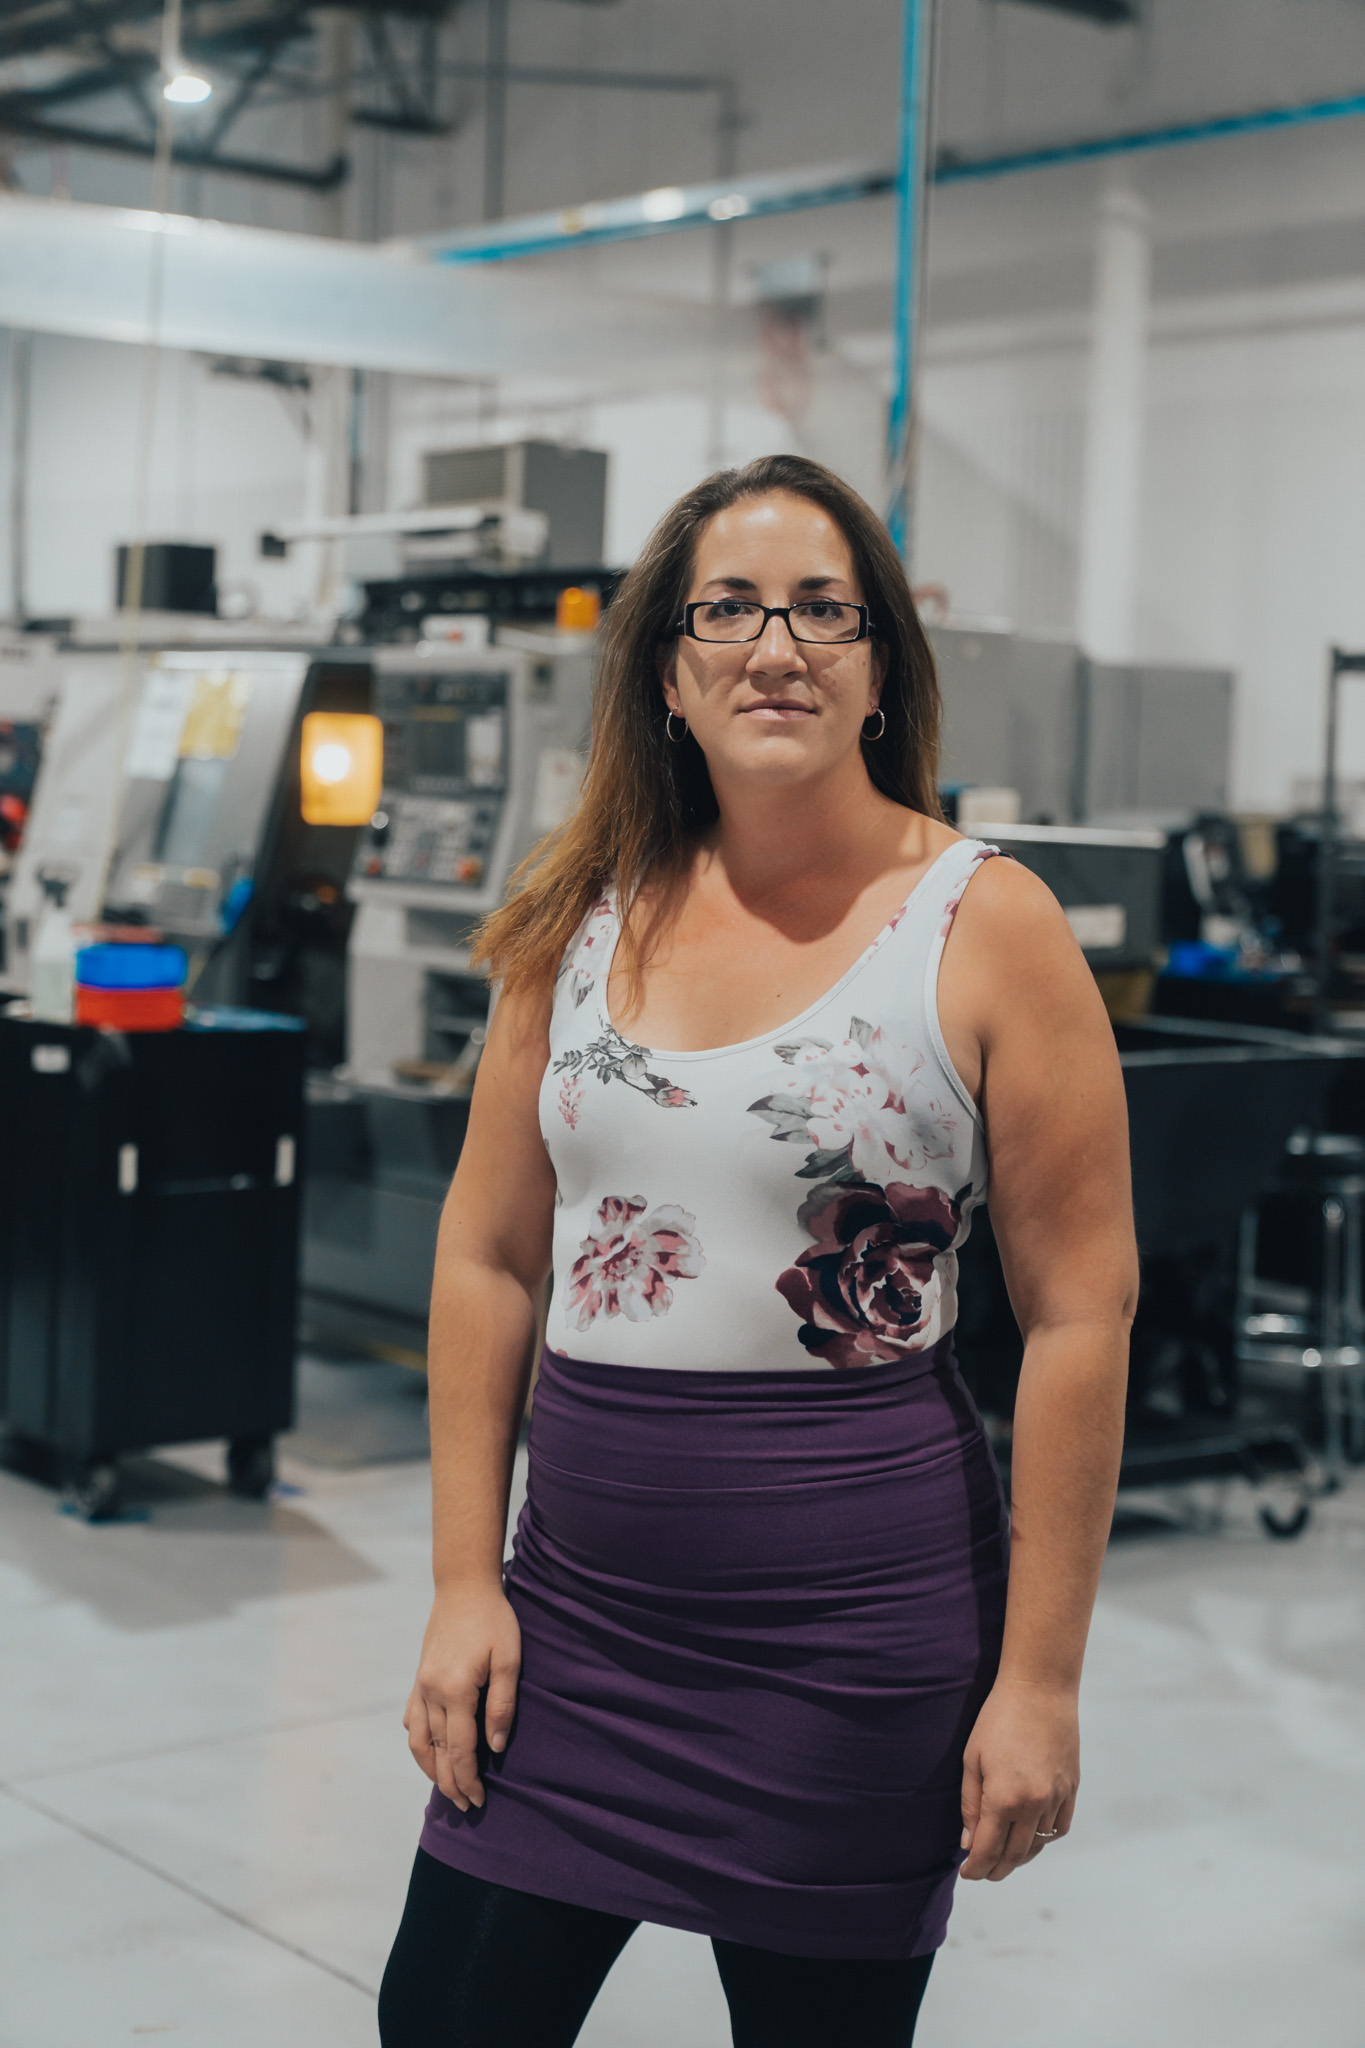 Isabelle Grandbois Adjointe administrative dans l'usine